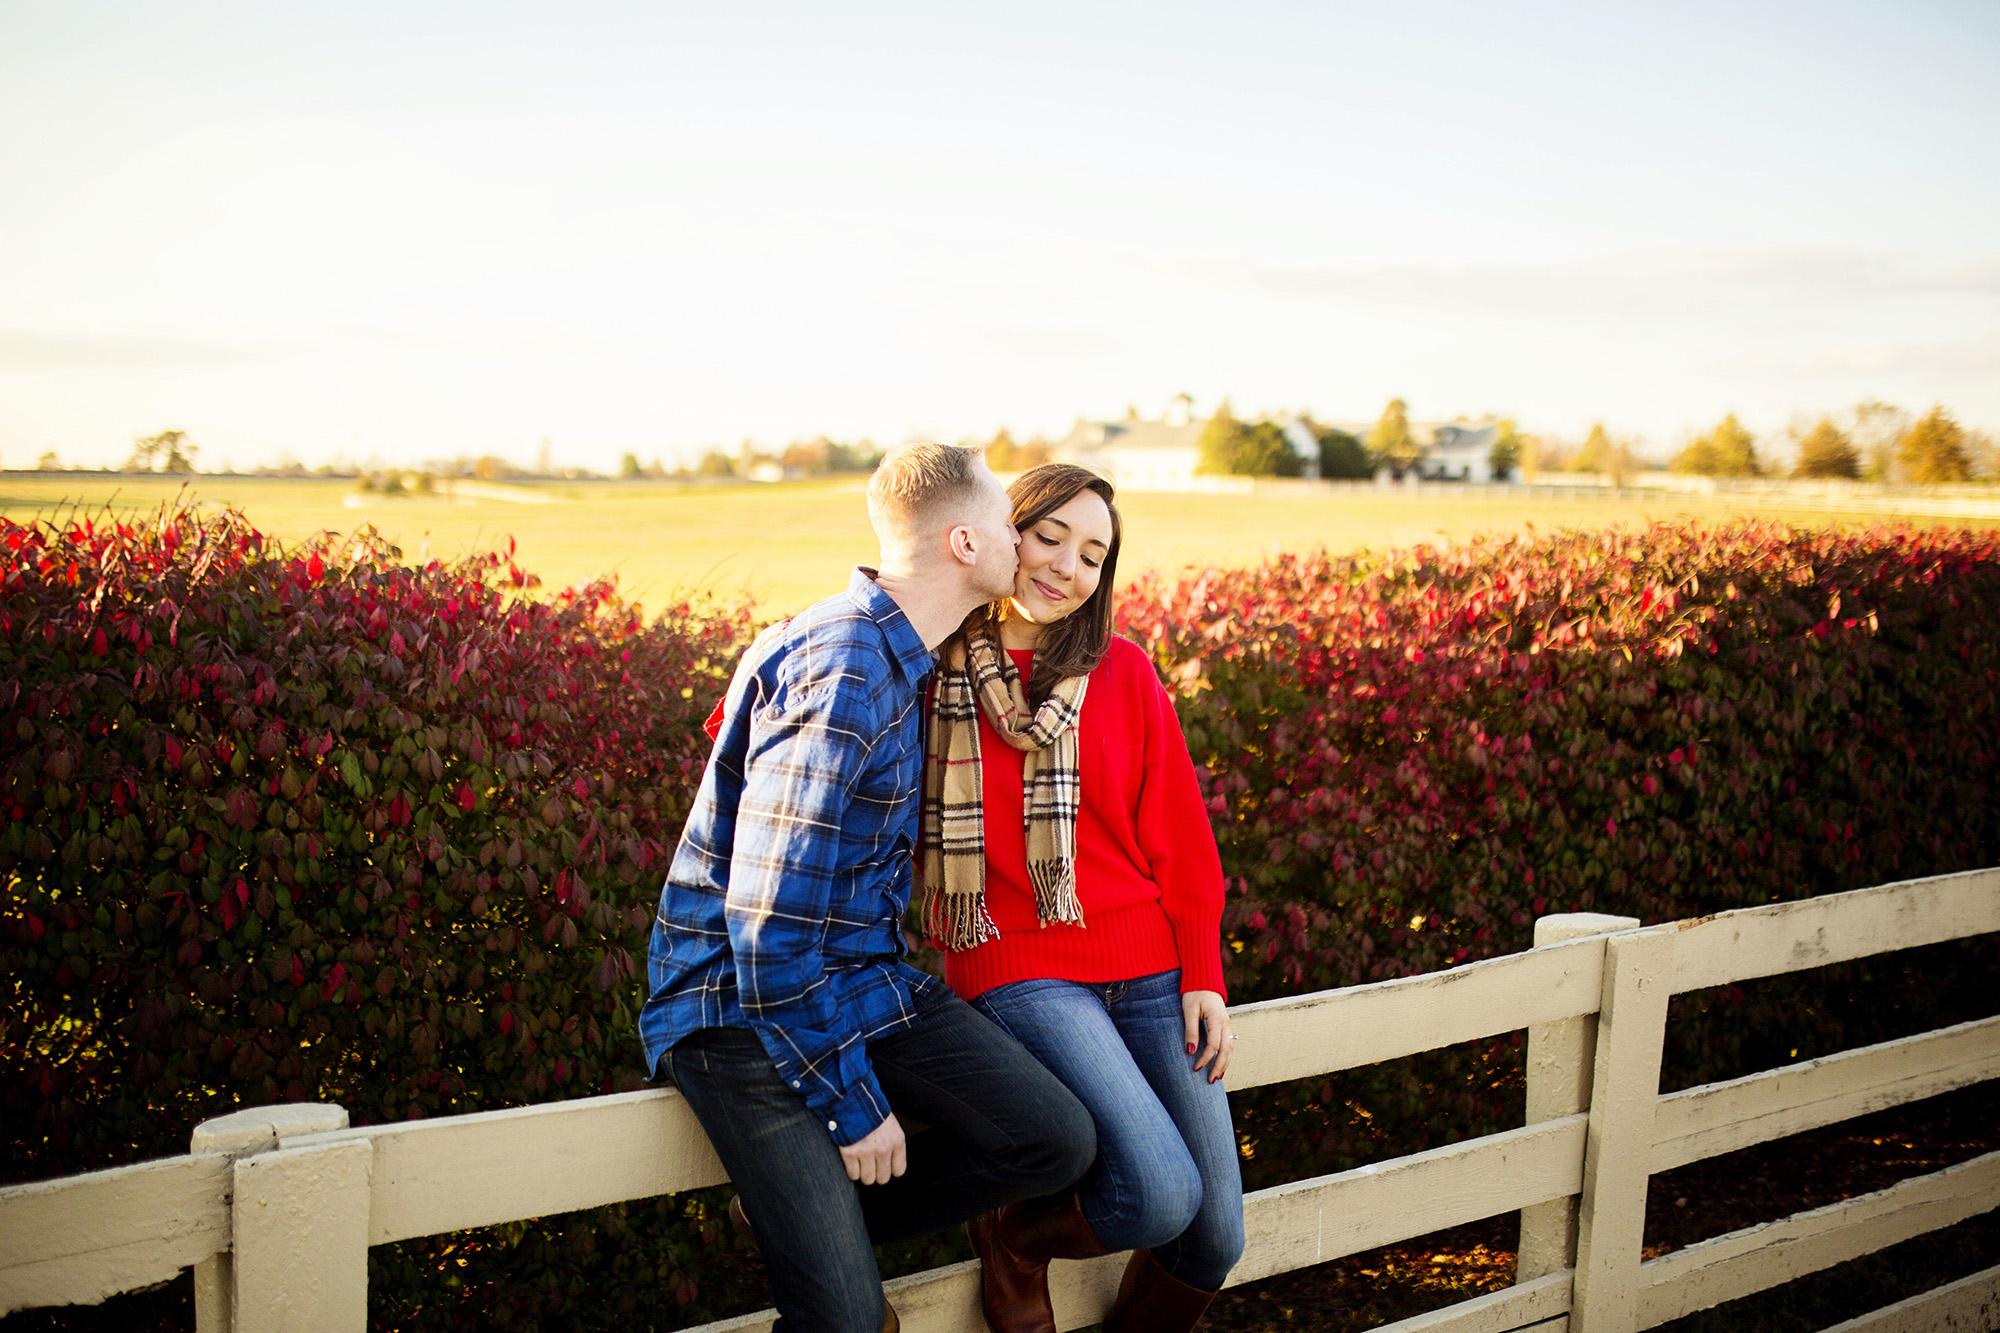 Seriously_Sabrina_Photography_Lexington_Kentucky_Backroads_Roadtrip_Engagement_RM061.jpg